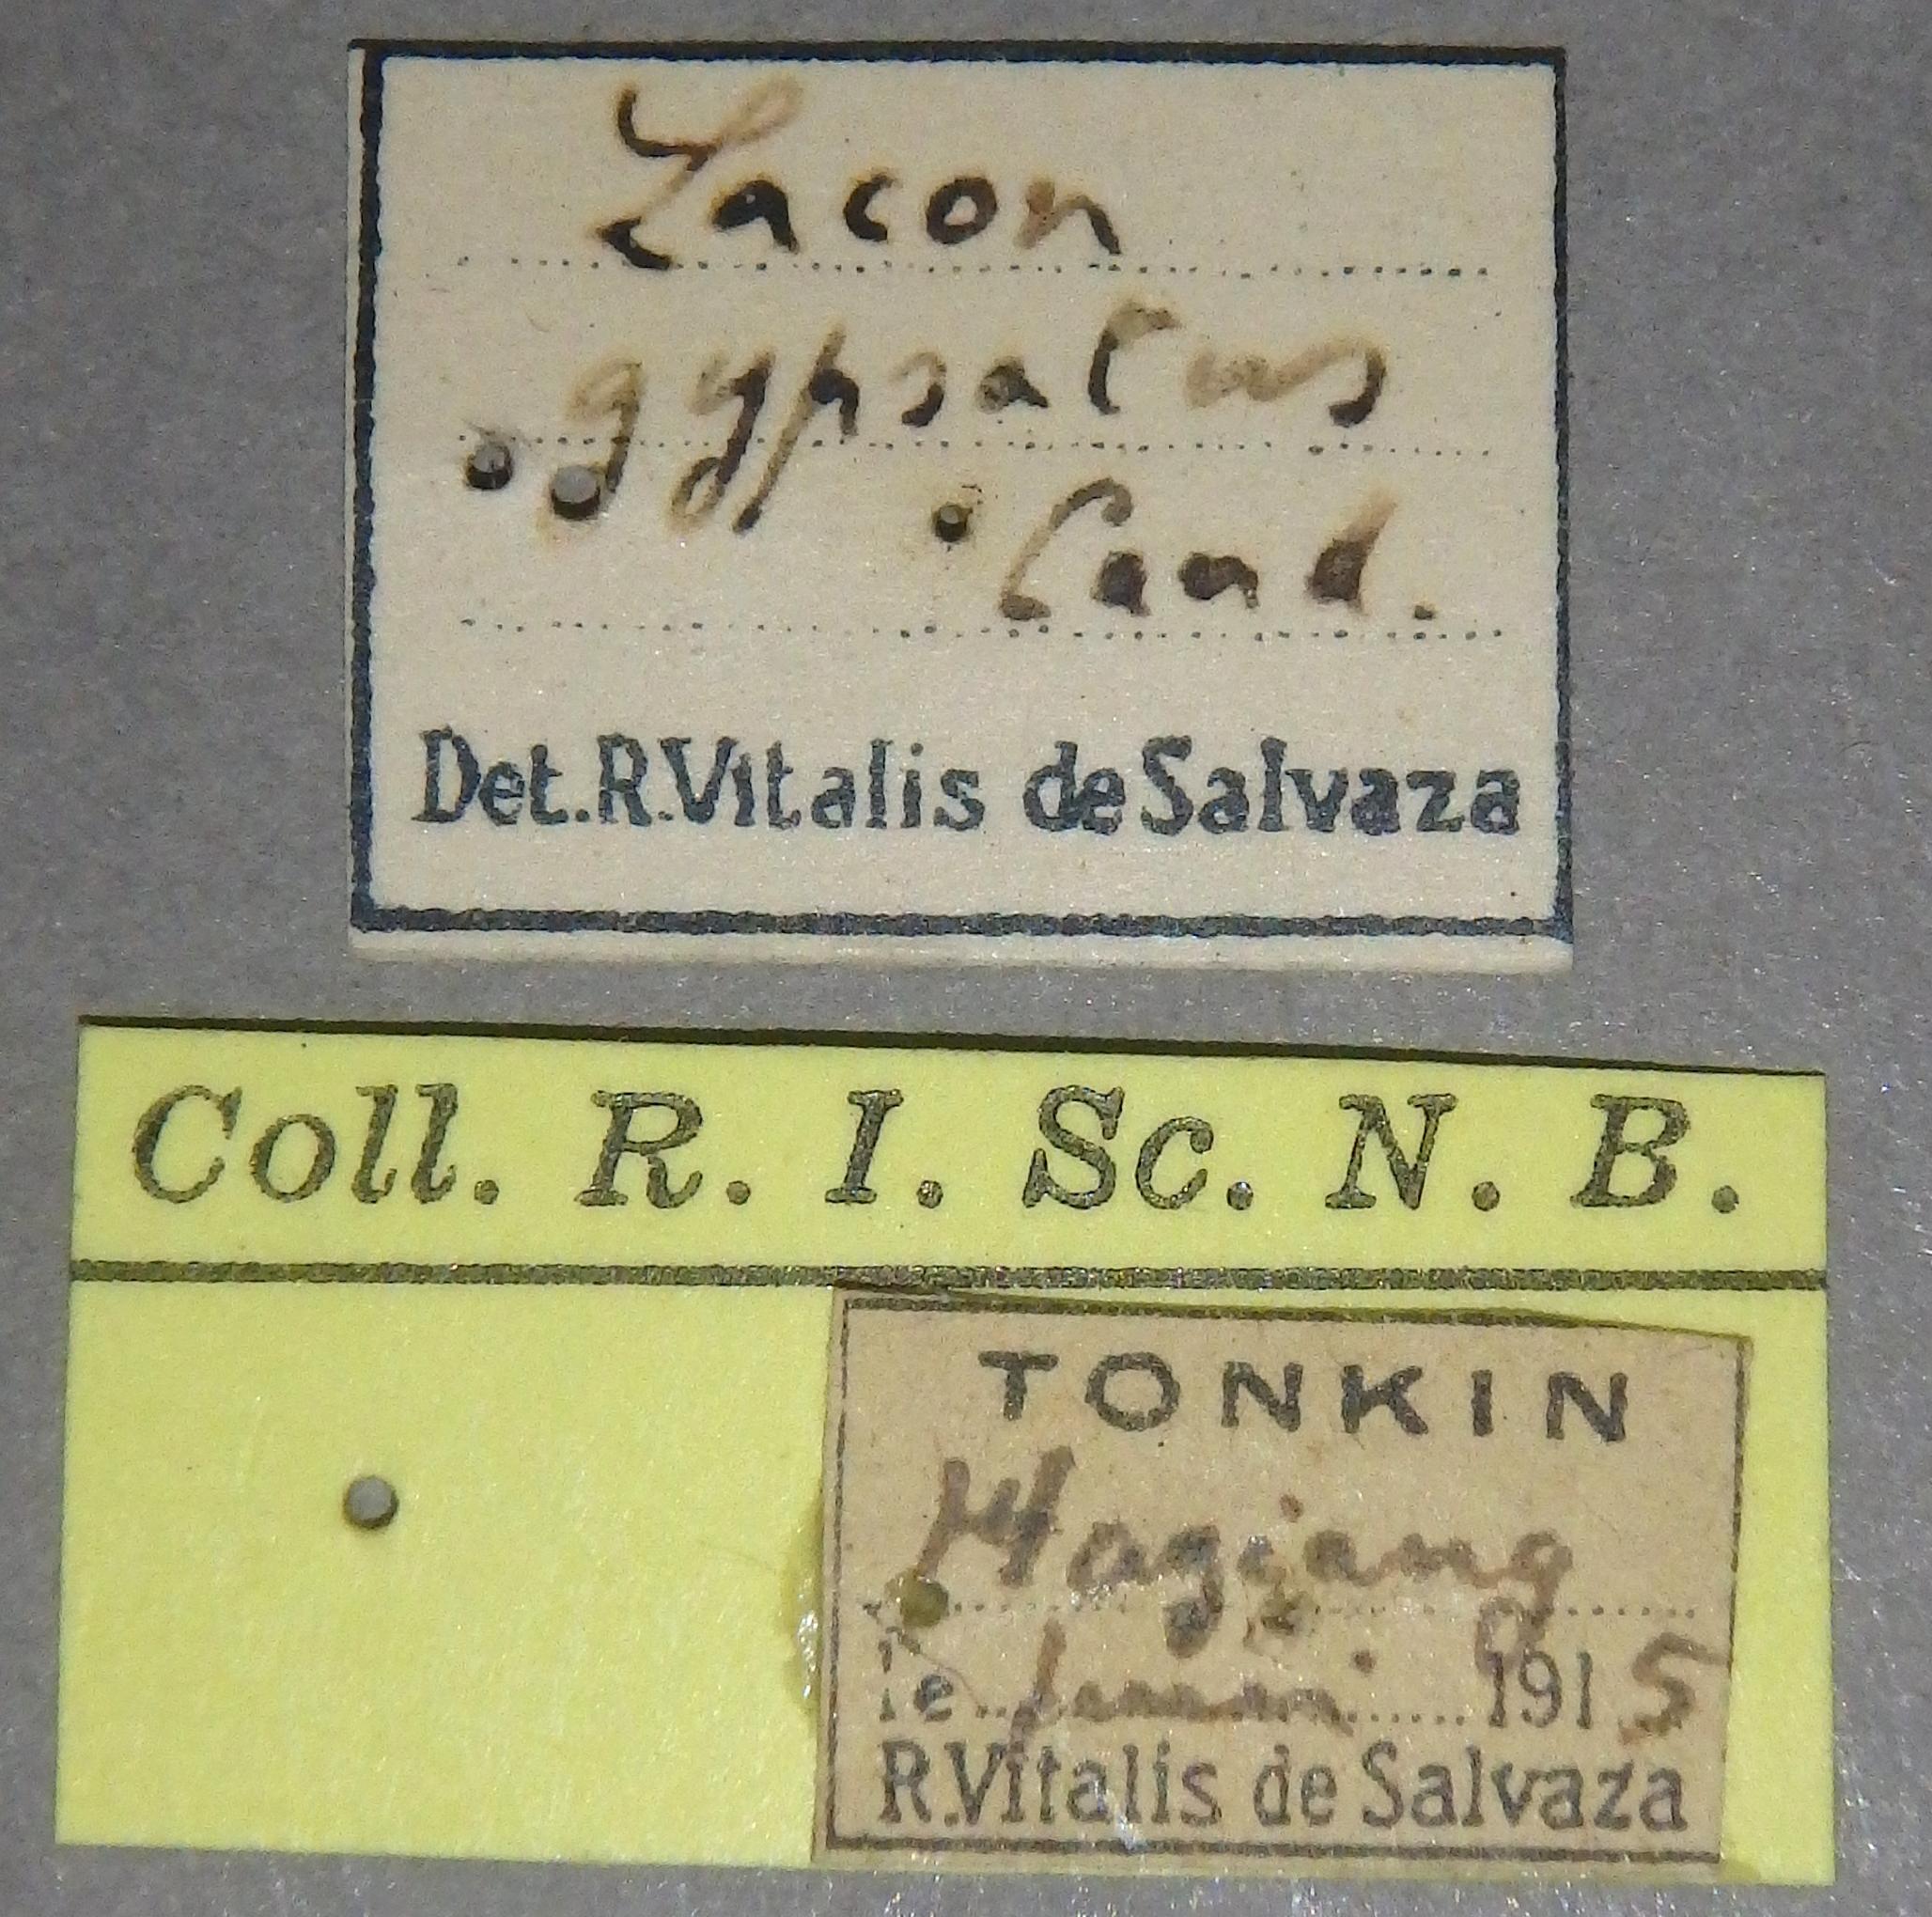 Lacon gypsatus nt1 Lb.JPG